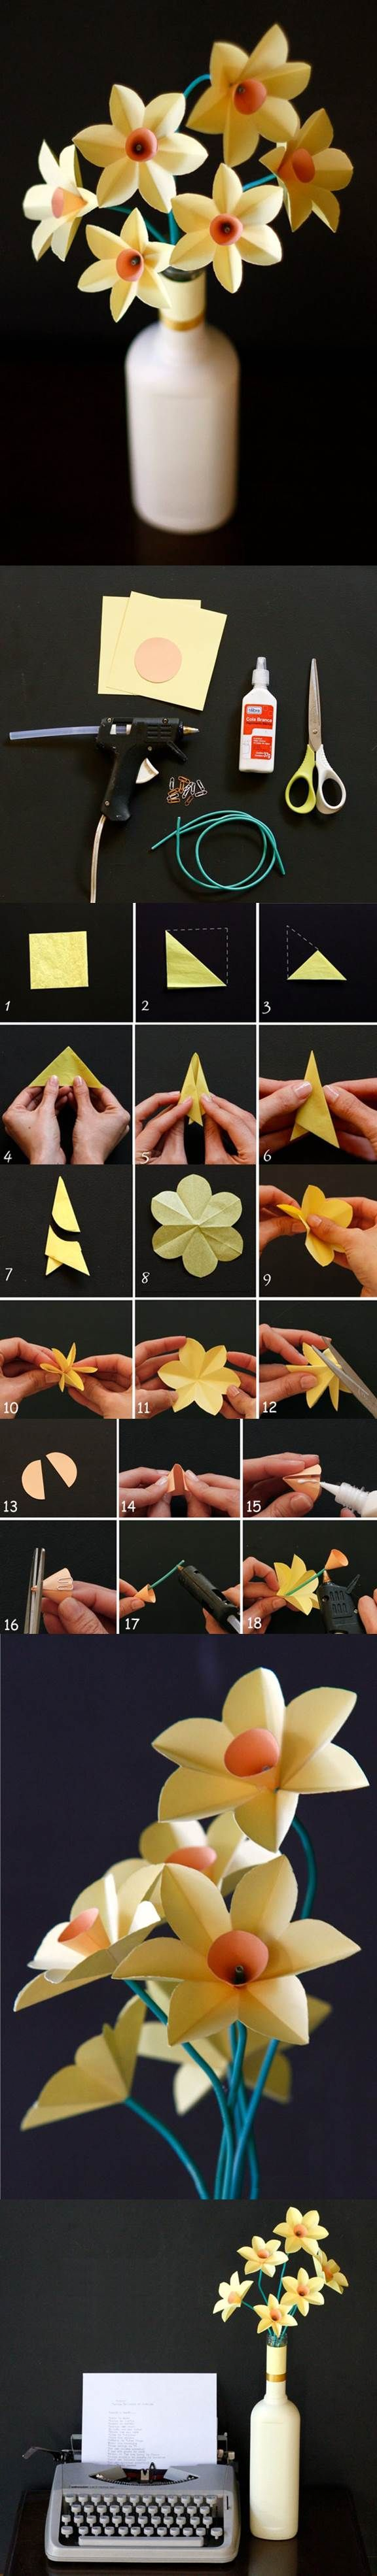 DIY Easy Paper Daffodils | iCreativeIdeas.com LIKE Us on Facebook ==> https://www.facebook.com/icreativeideas